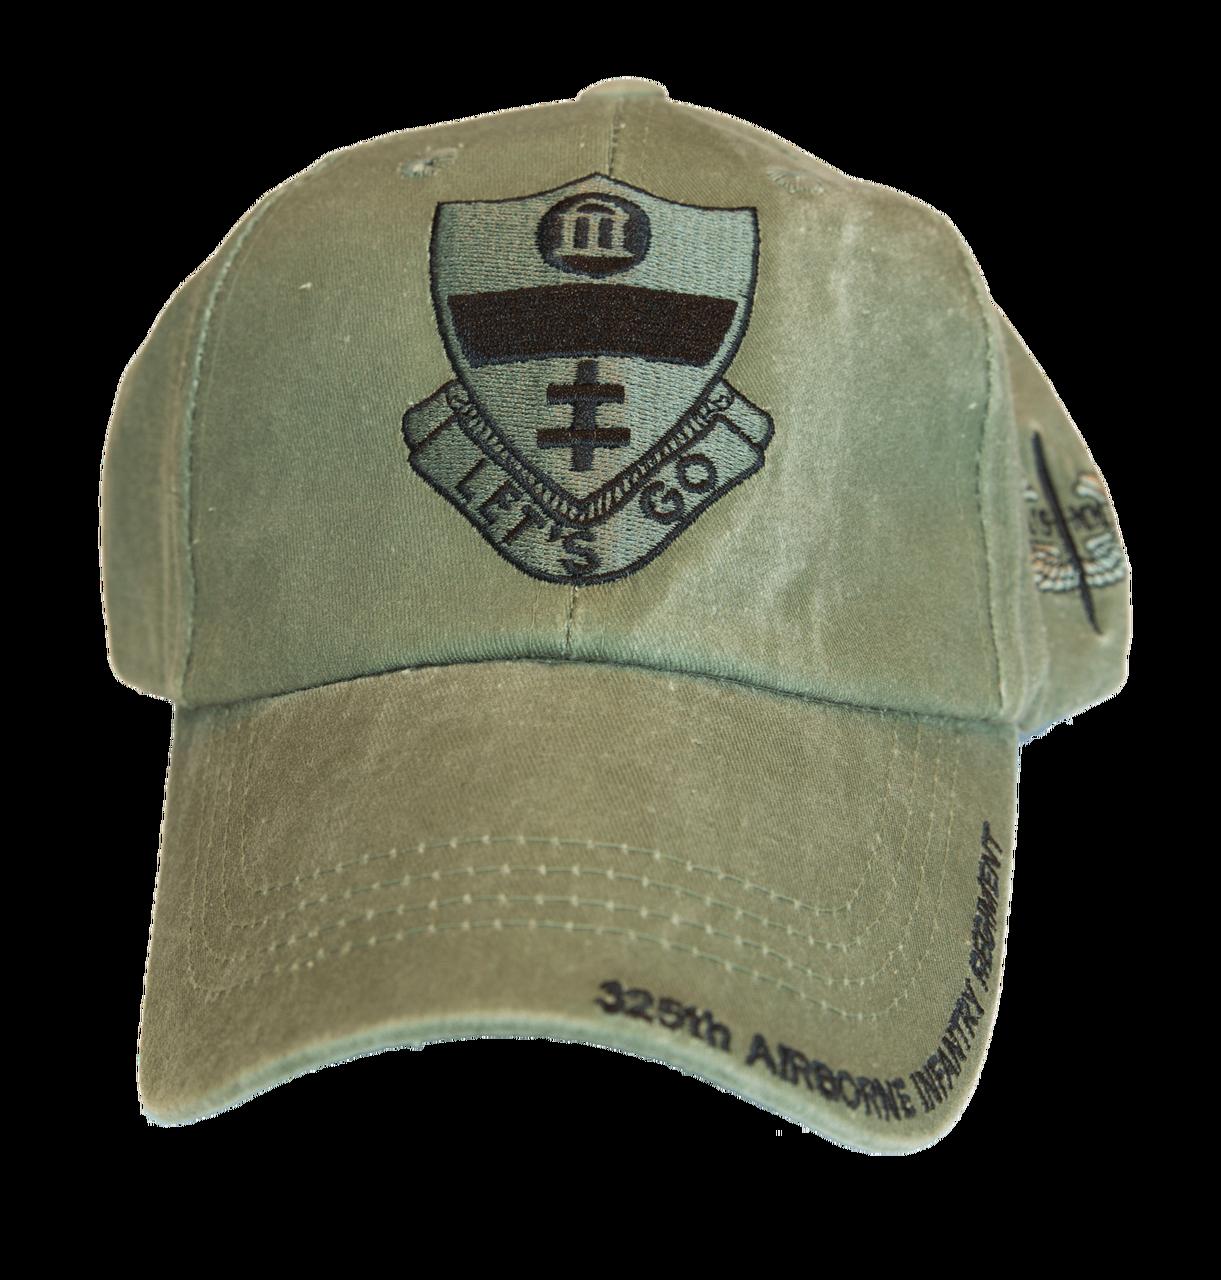 c76b2c1a26b7b 325th Airborne Infantry Regiment (AIR) Baseball Cap - US Military  Marketplace